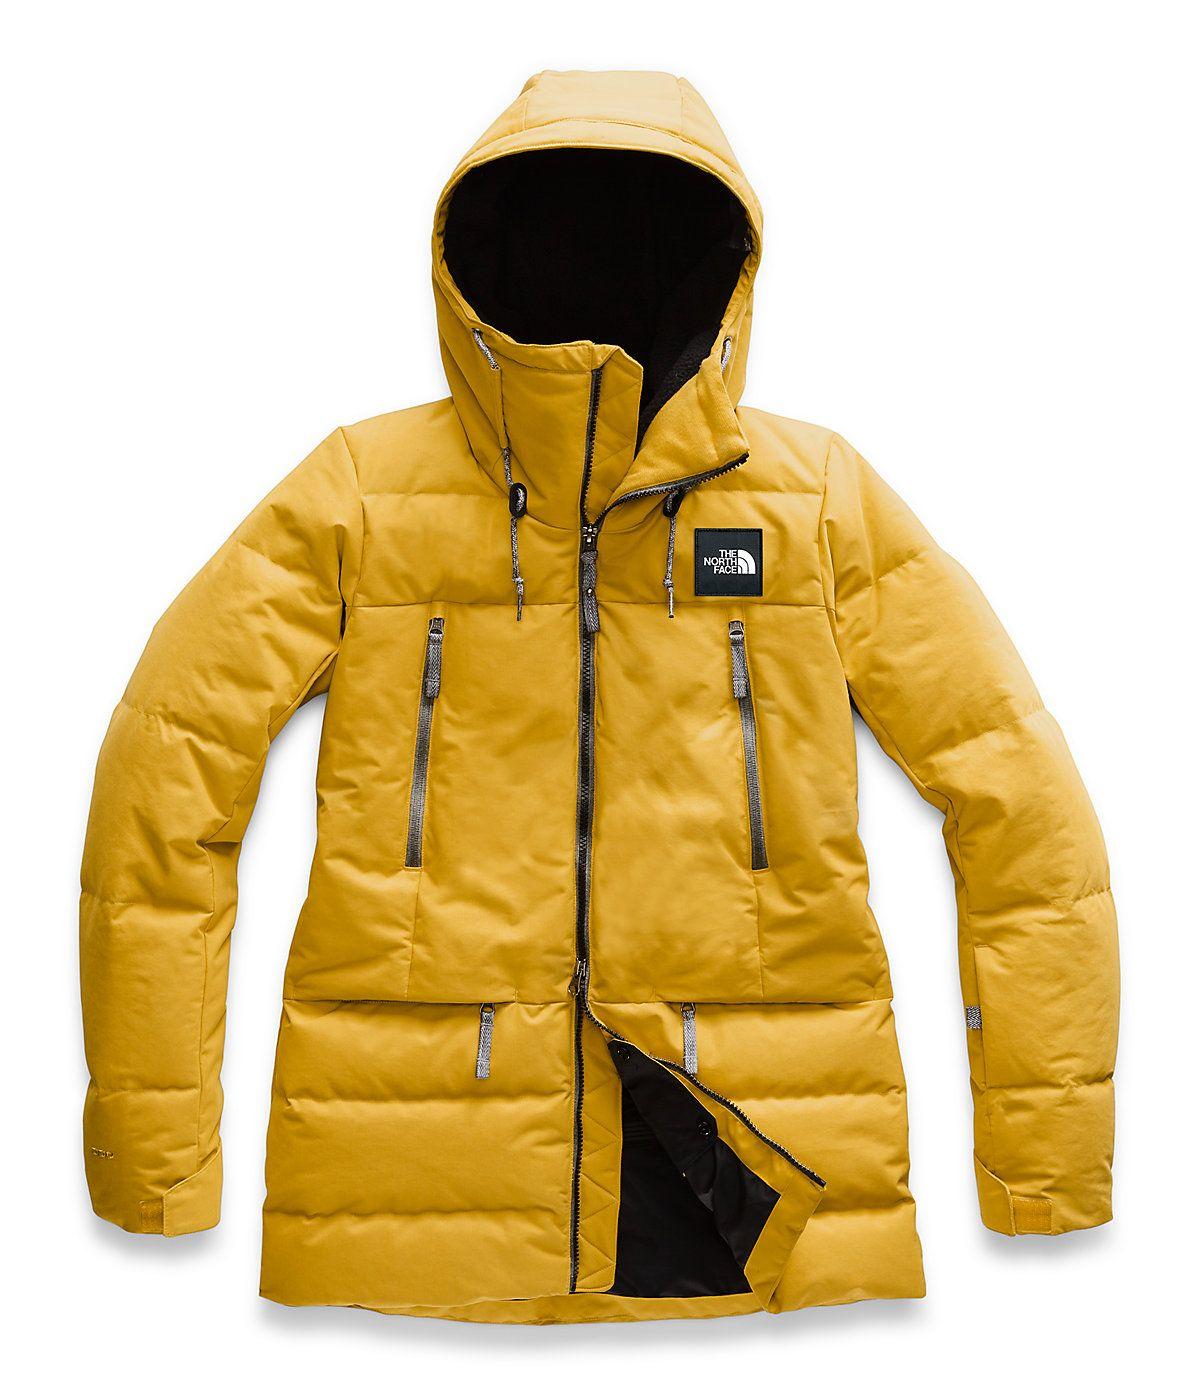 Women S Pallie Down Jacket The North Face Ski Jacket Jackets Down Jacket [ 1396 x 1200 Pixel ]